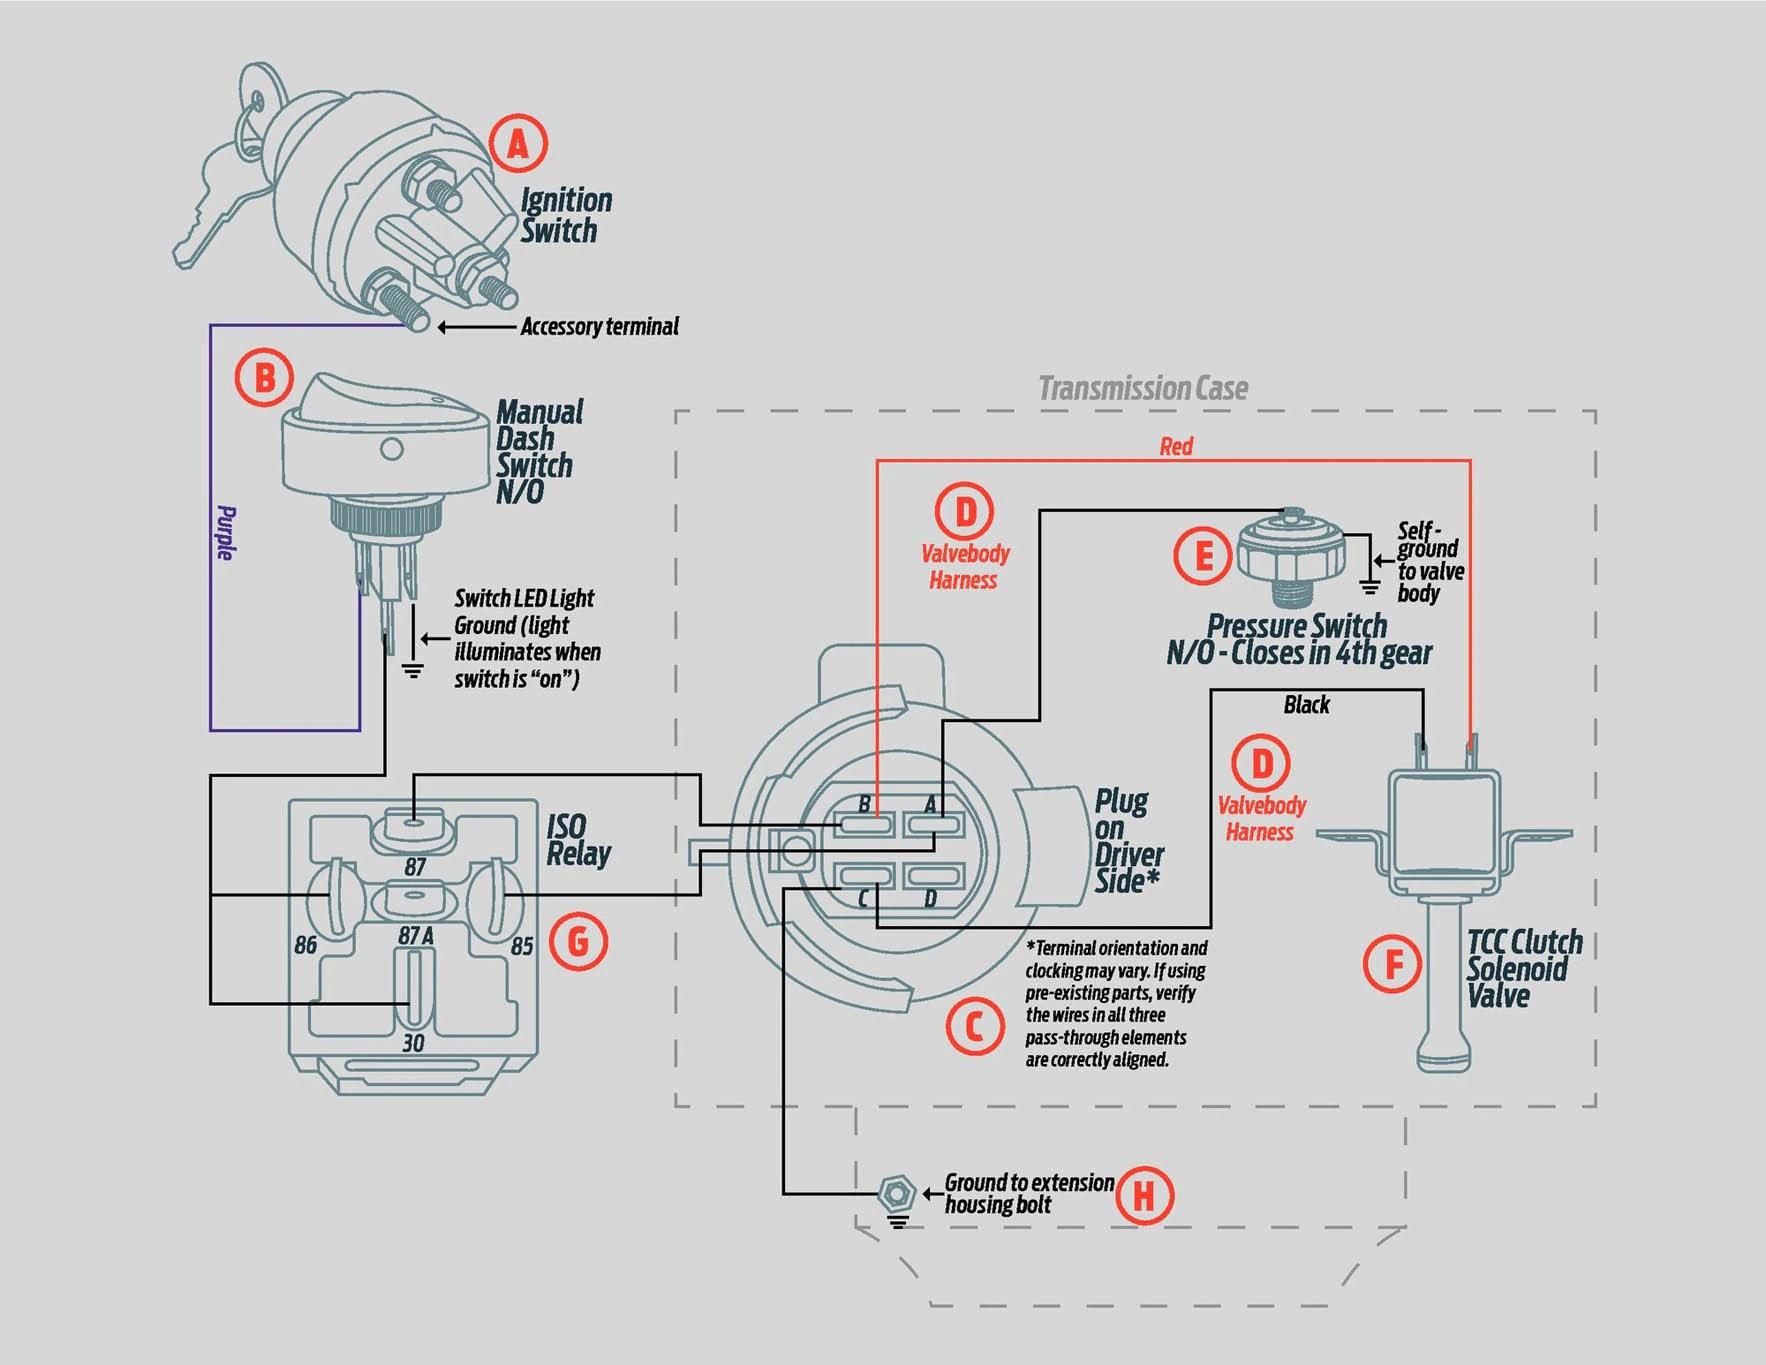 medium resolution of 700r4 gm transmission wiring diagram circuit diagram template th350 transmission cooling lines diagrams gm transmission diagrams